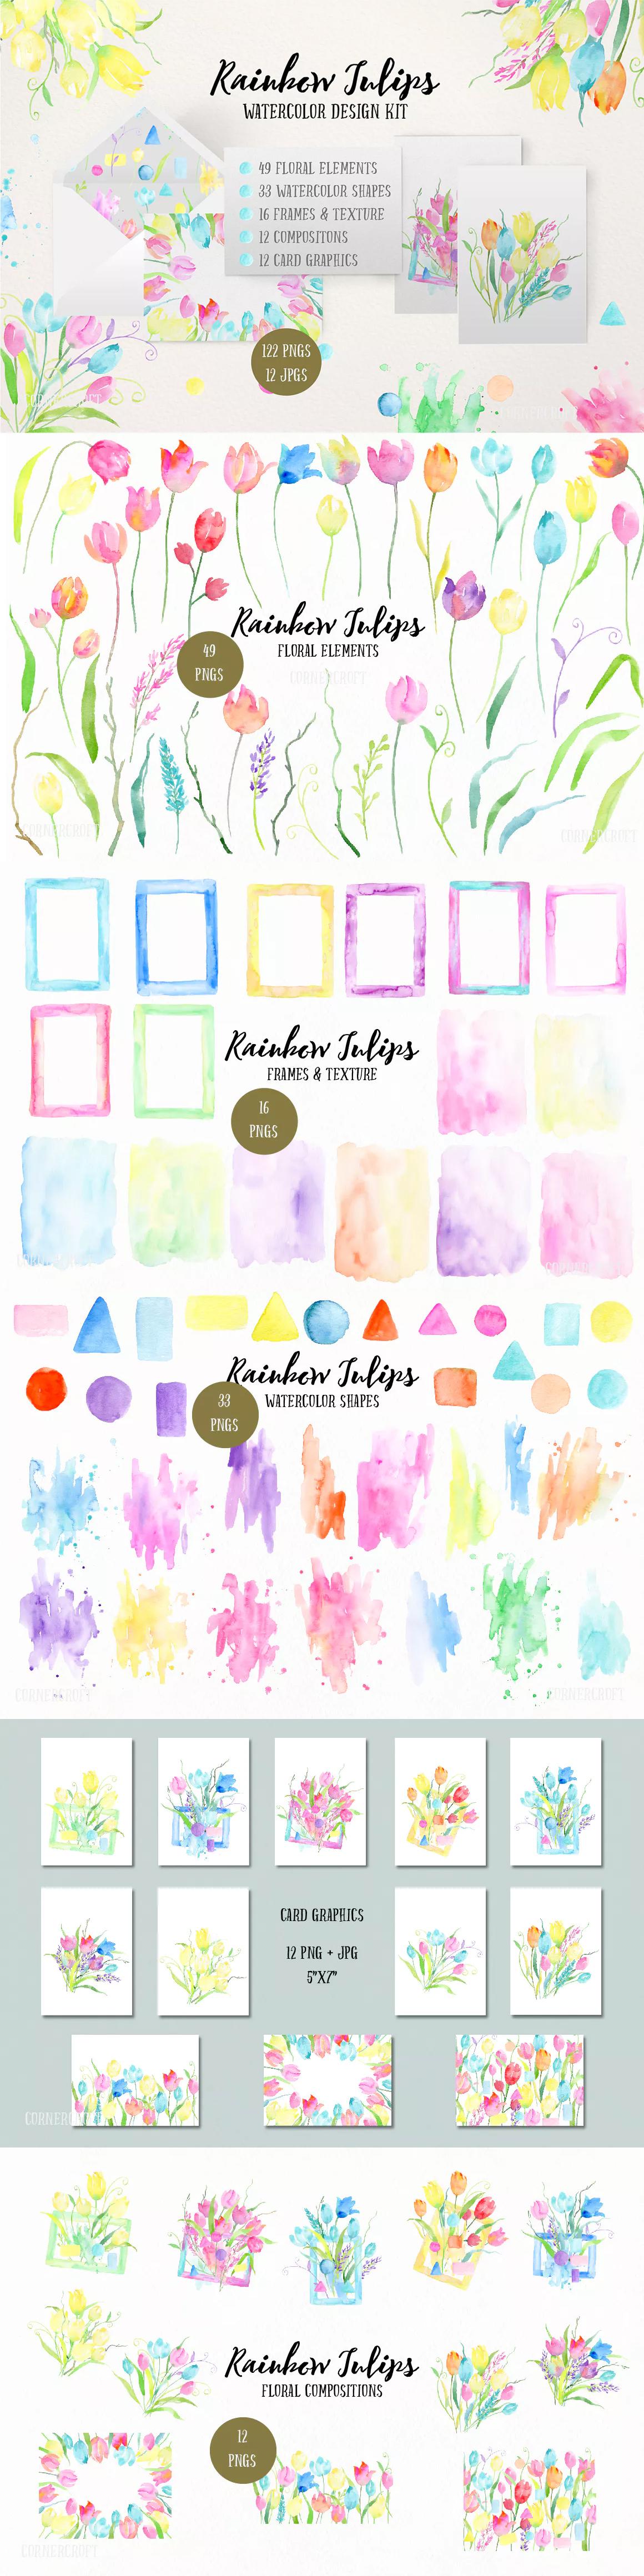 watercolor design kit rainbow tulips template png wedding